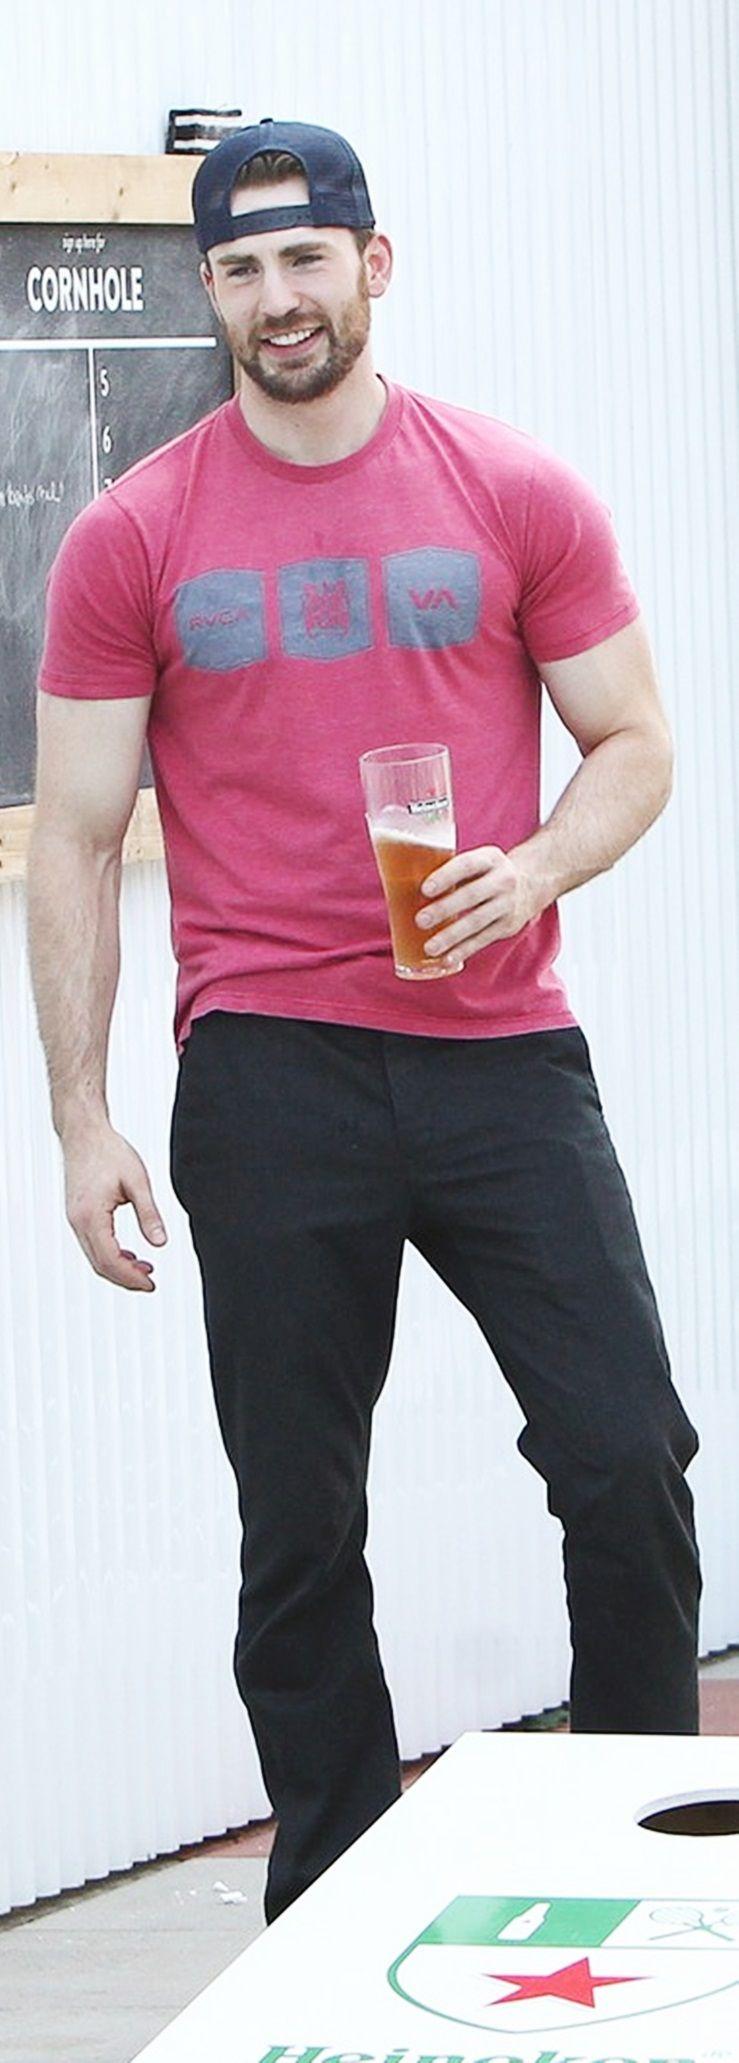 The most sexiest man in the world! Sin Duda Lo Mas Bello Sobre La ...